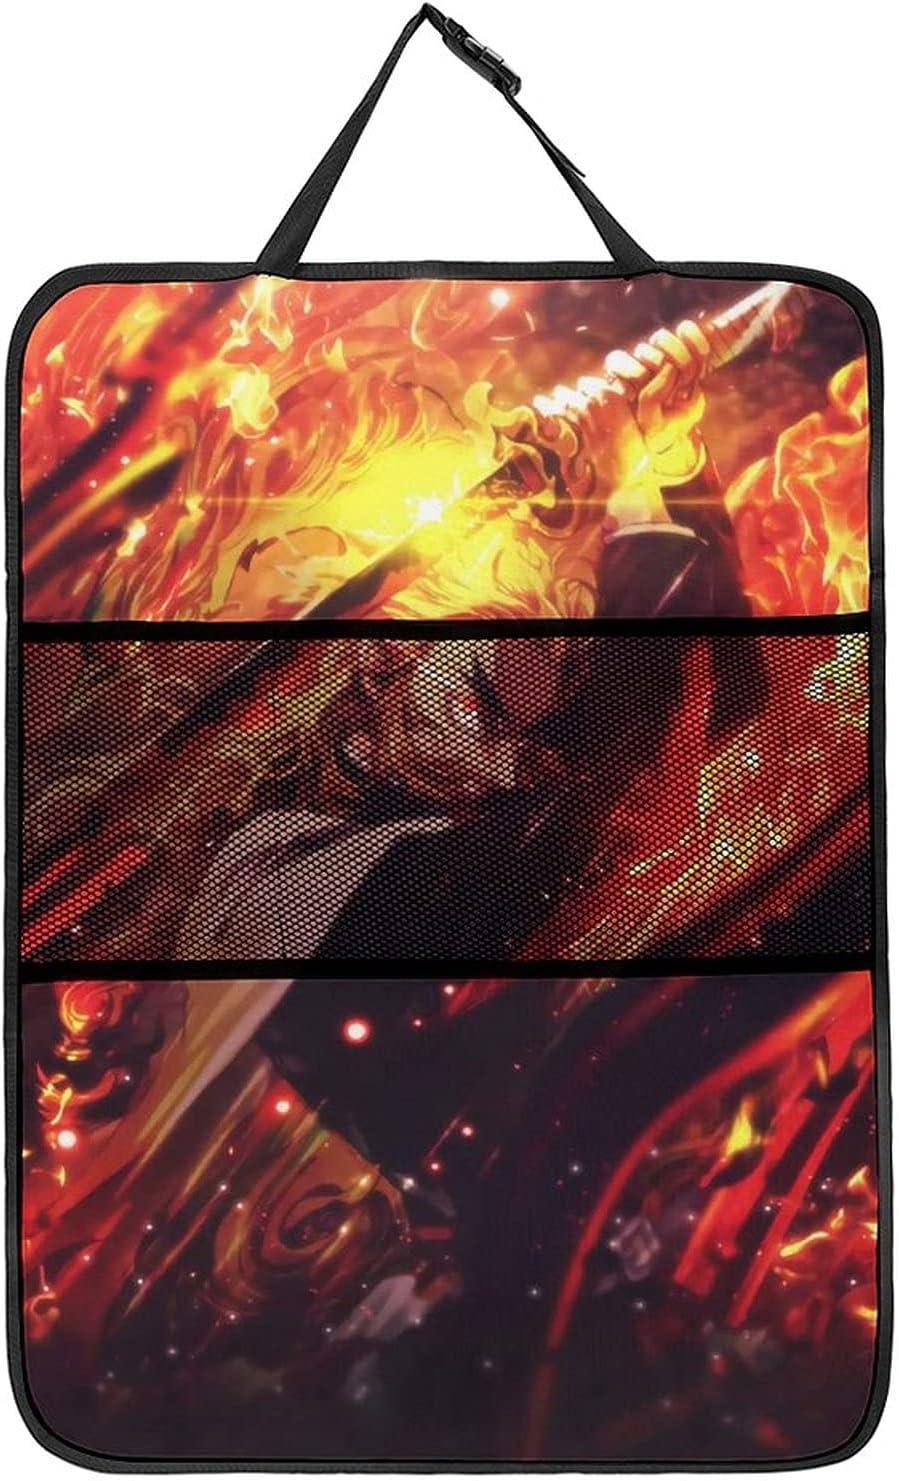 Demon Slayer Phoenix Mall Rengoku Kyoujurou Car Organizer Ma Back Kick Seat - It is very popular